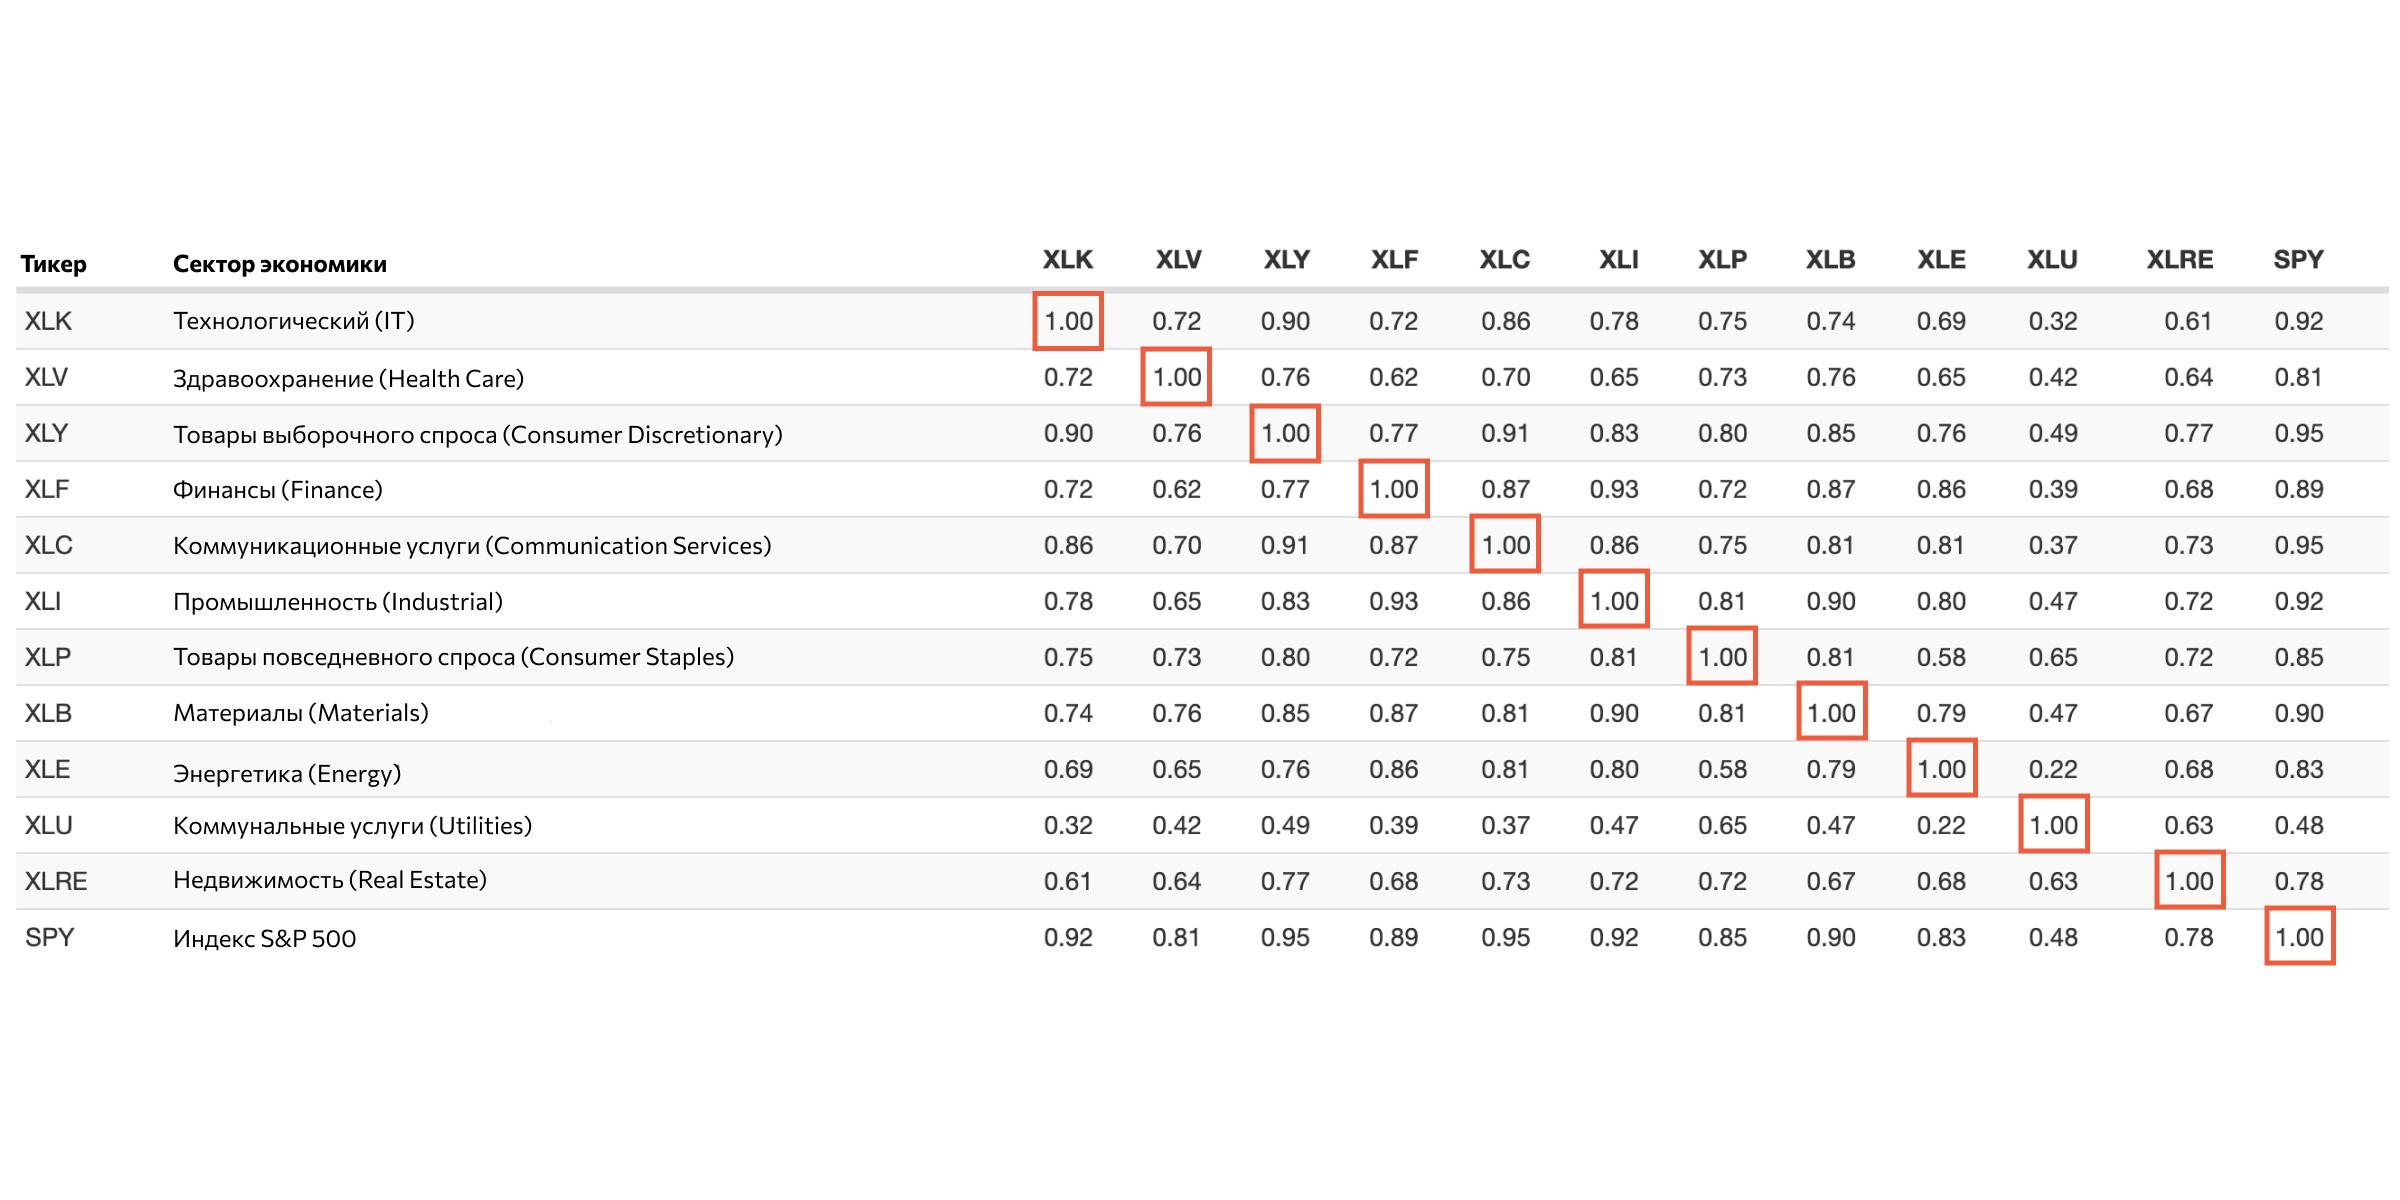 Диверсификация важна: корреляции между секторами S&P 500 в июле-августе 2021 года